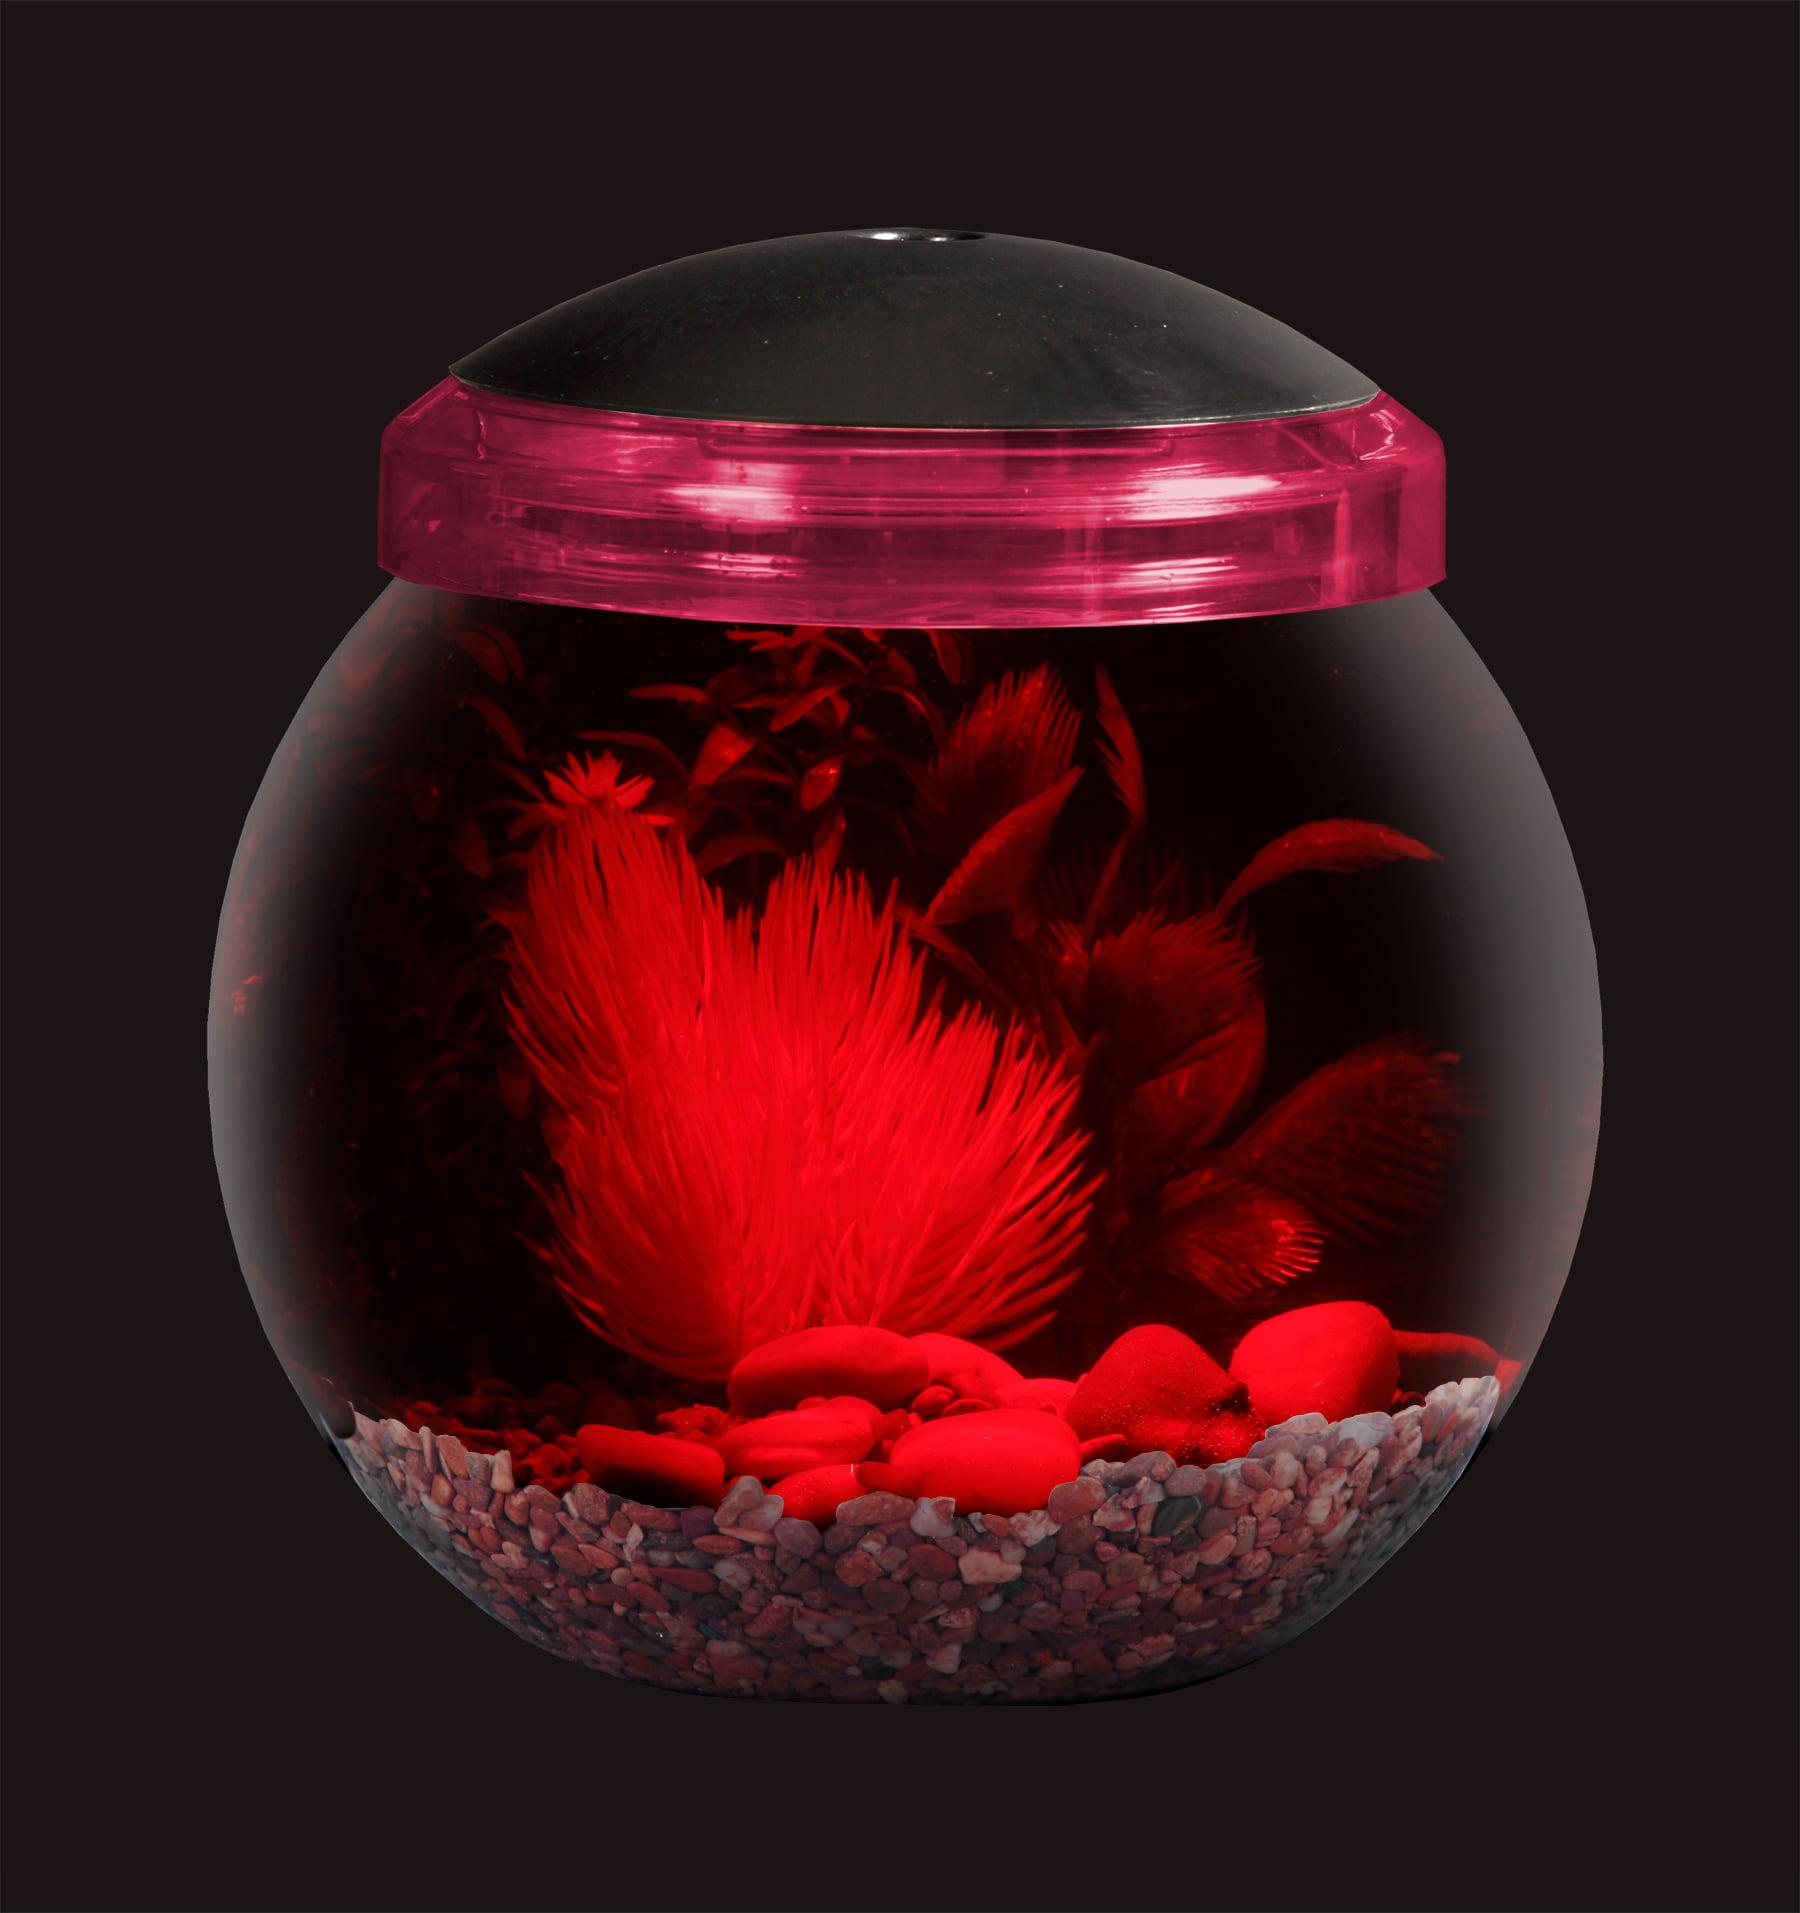 how to make led light for fish bowl